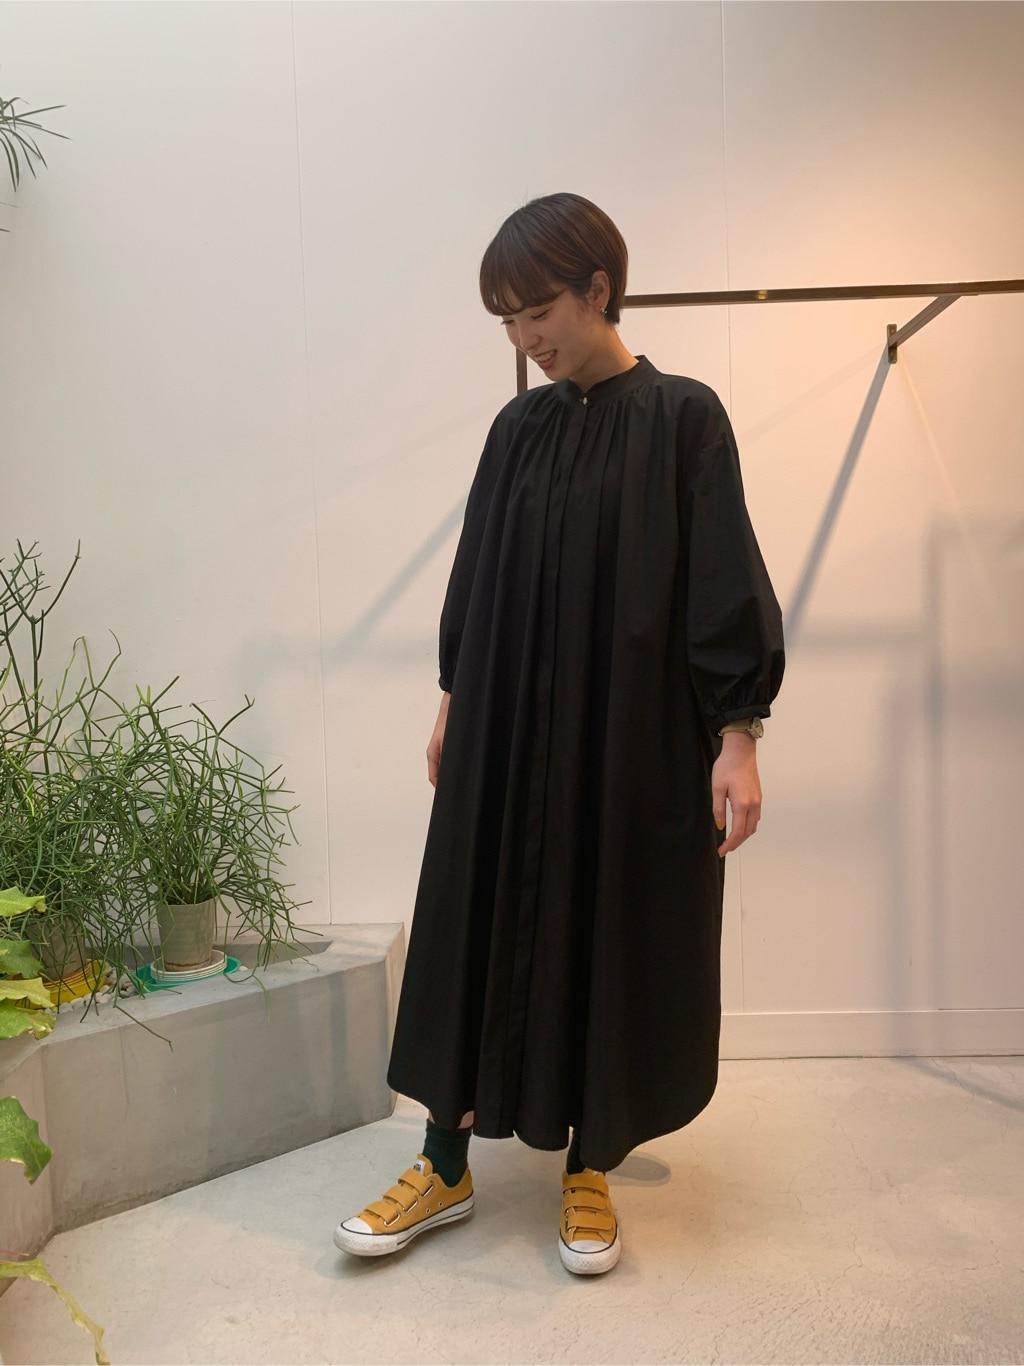 l'atelier du savon 名古屋栄路面 身長:161cm 2020.04.11